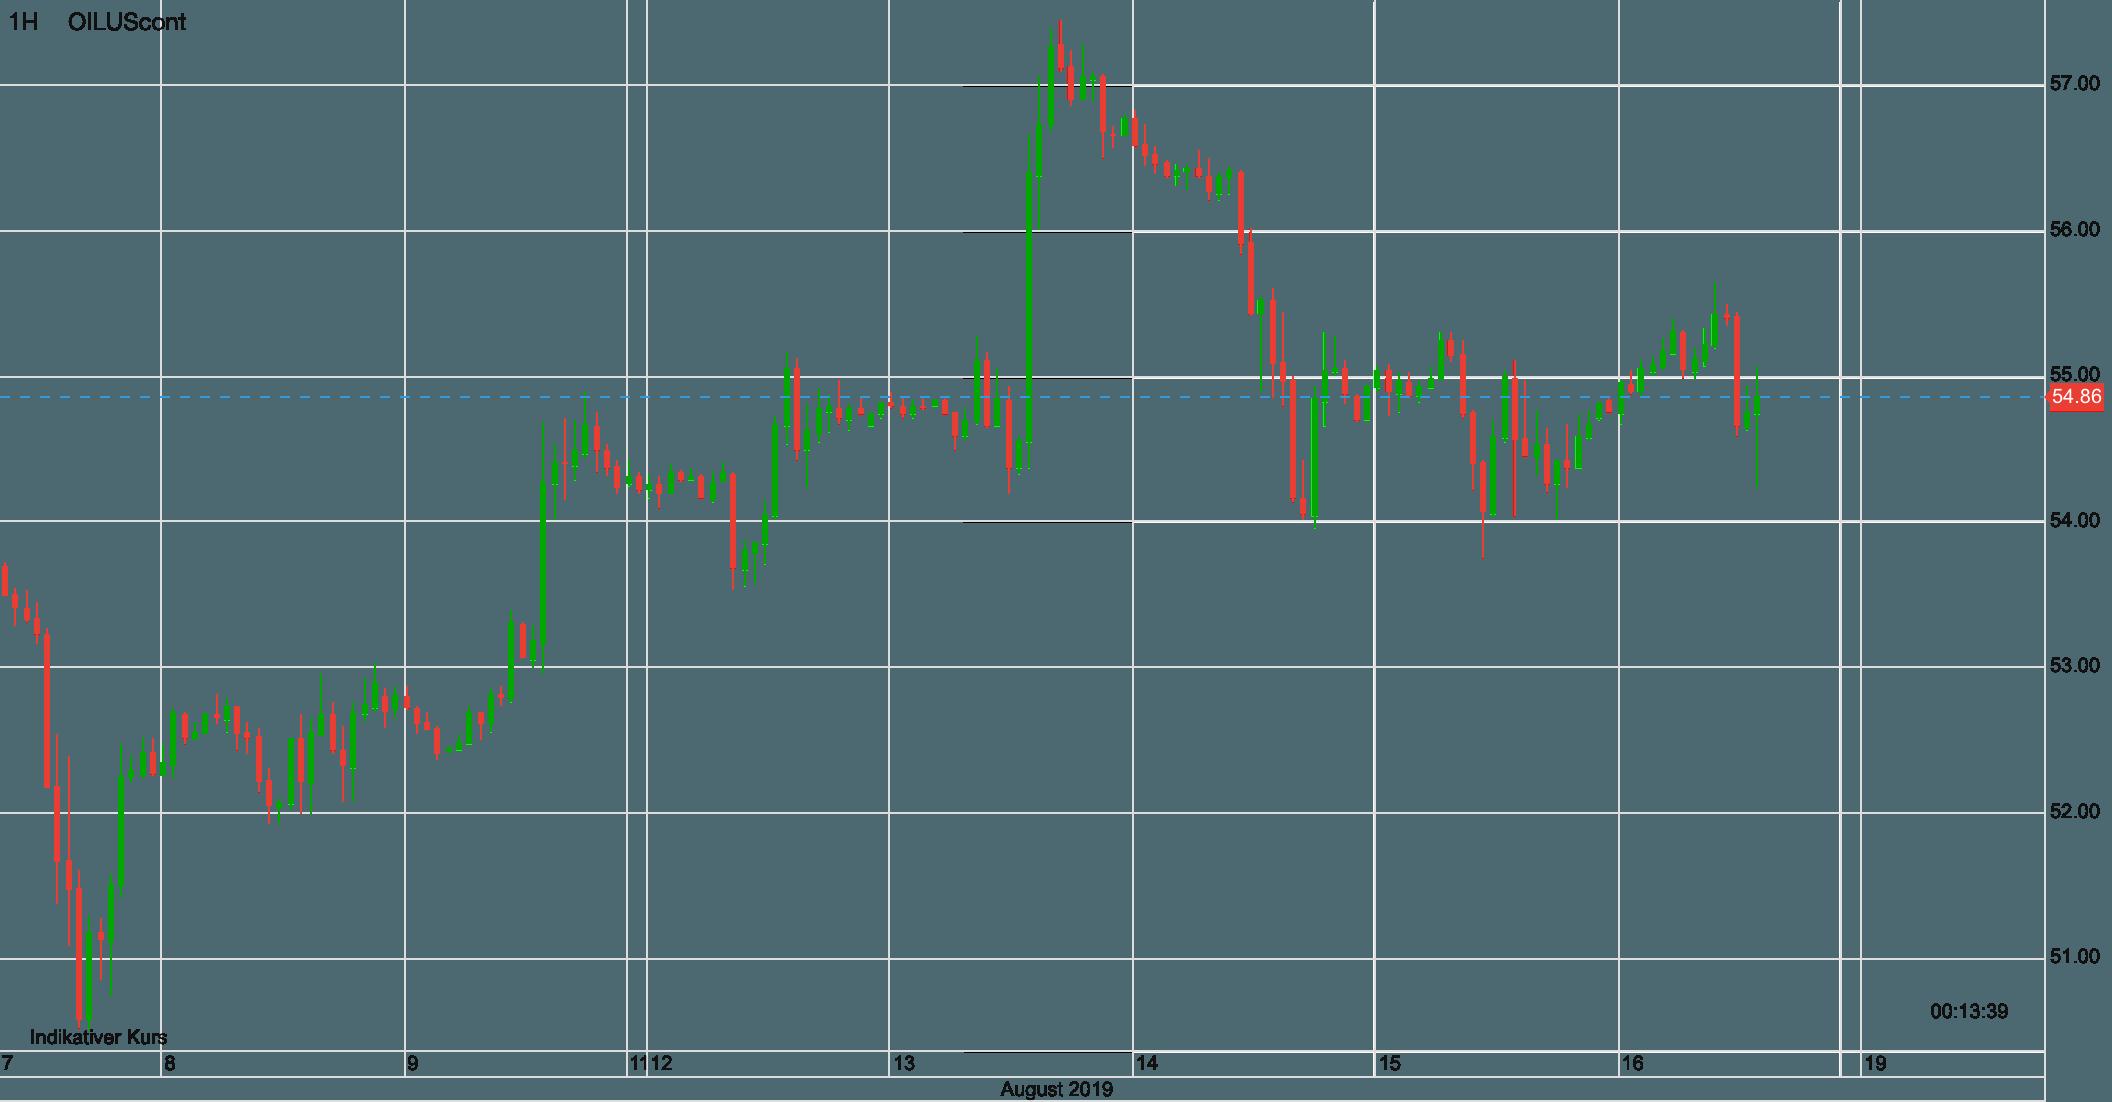 WTI Ölpreis seit 7. August